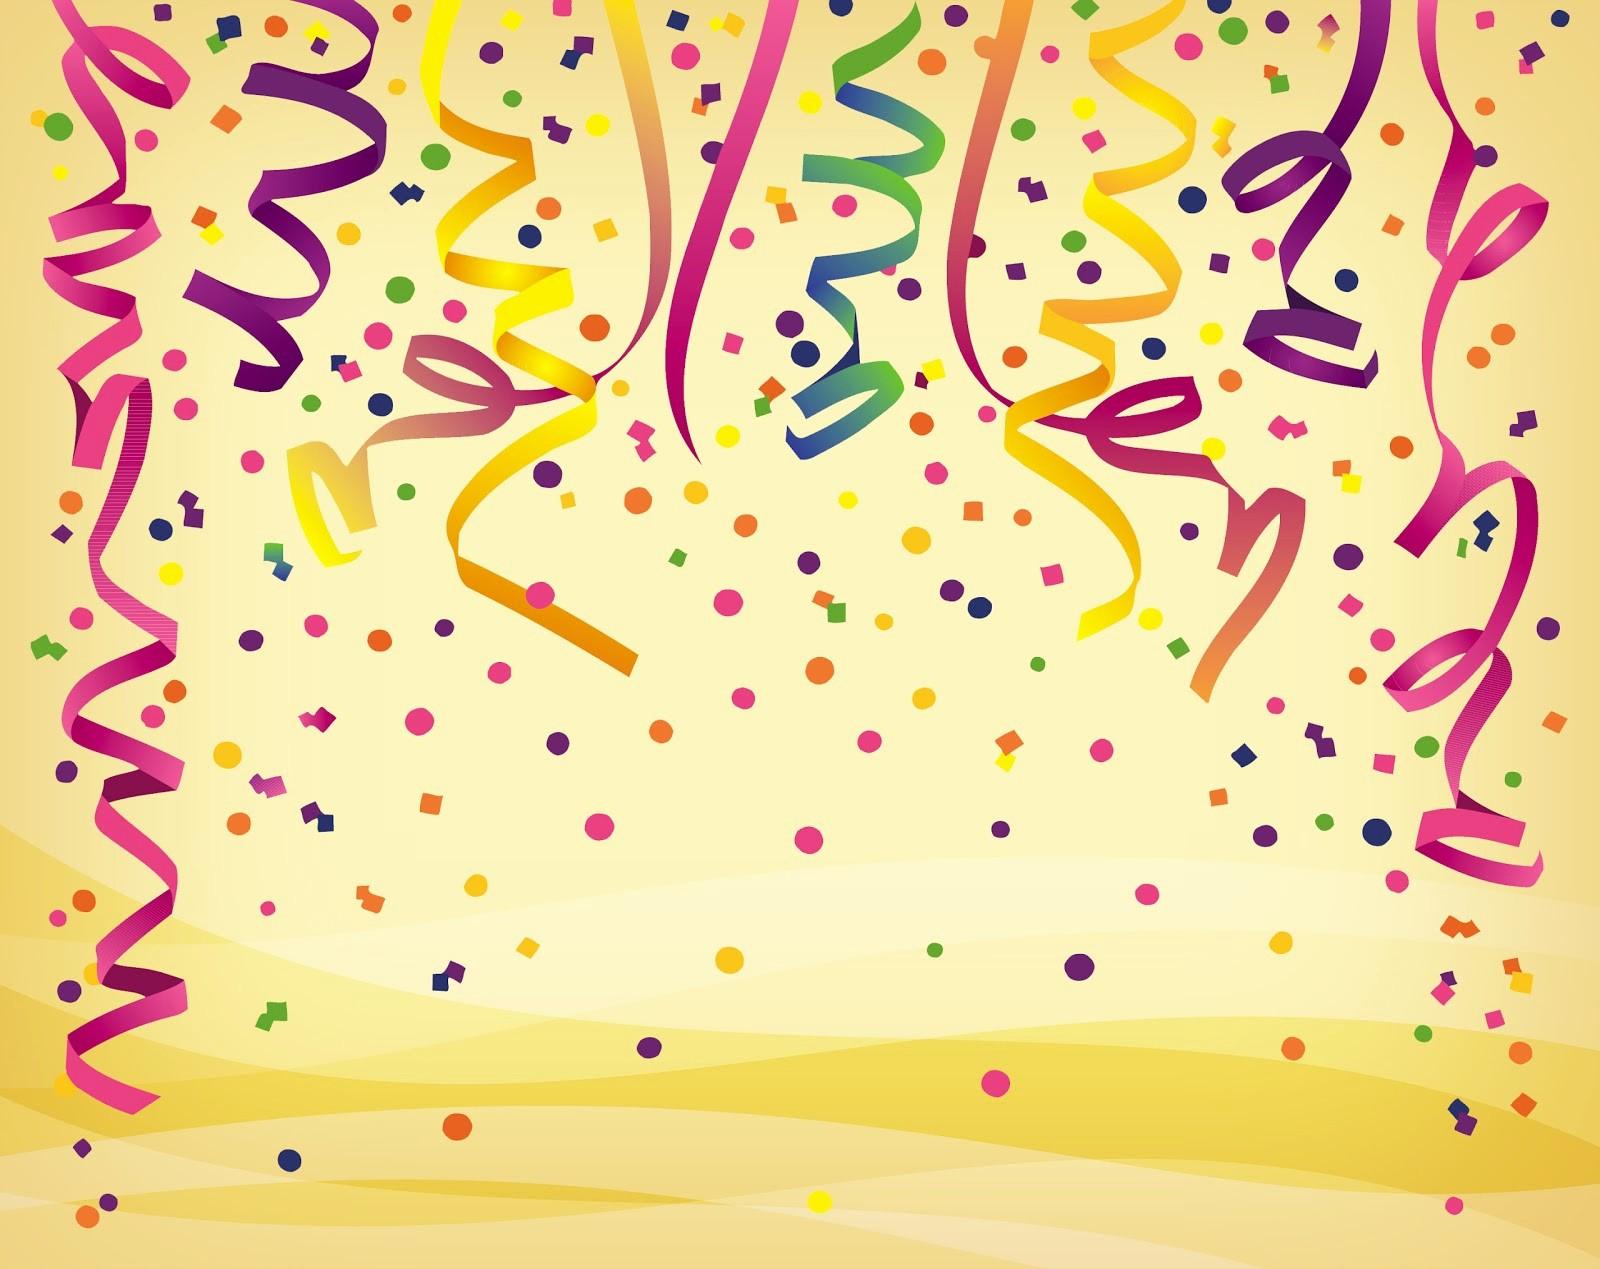 Fondos Para Tarjetas De Cumpleaños Beautiful Fondos Para Cumpleaños Plantillas Recursos Y Más